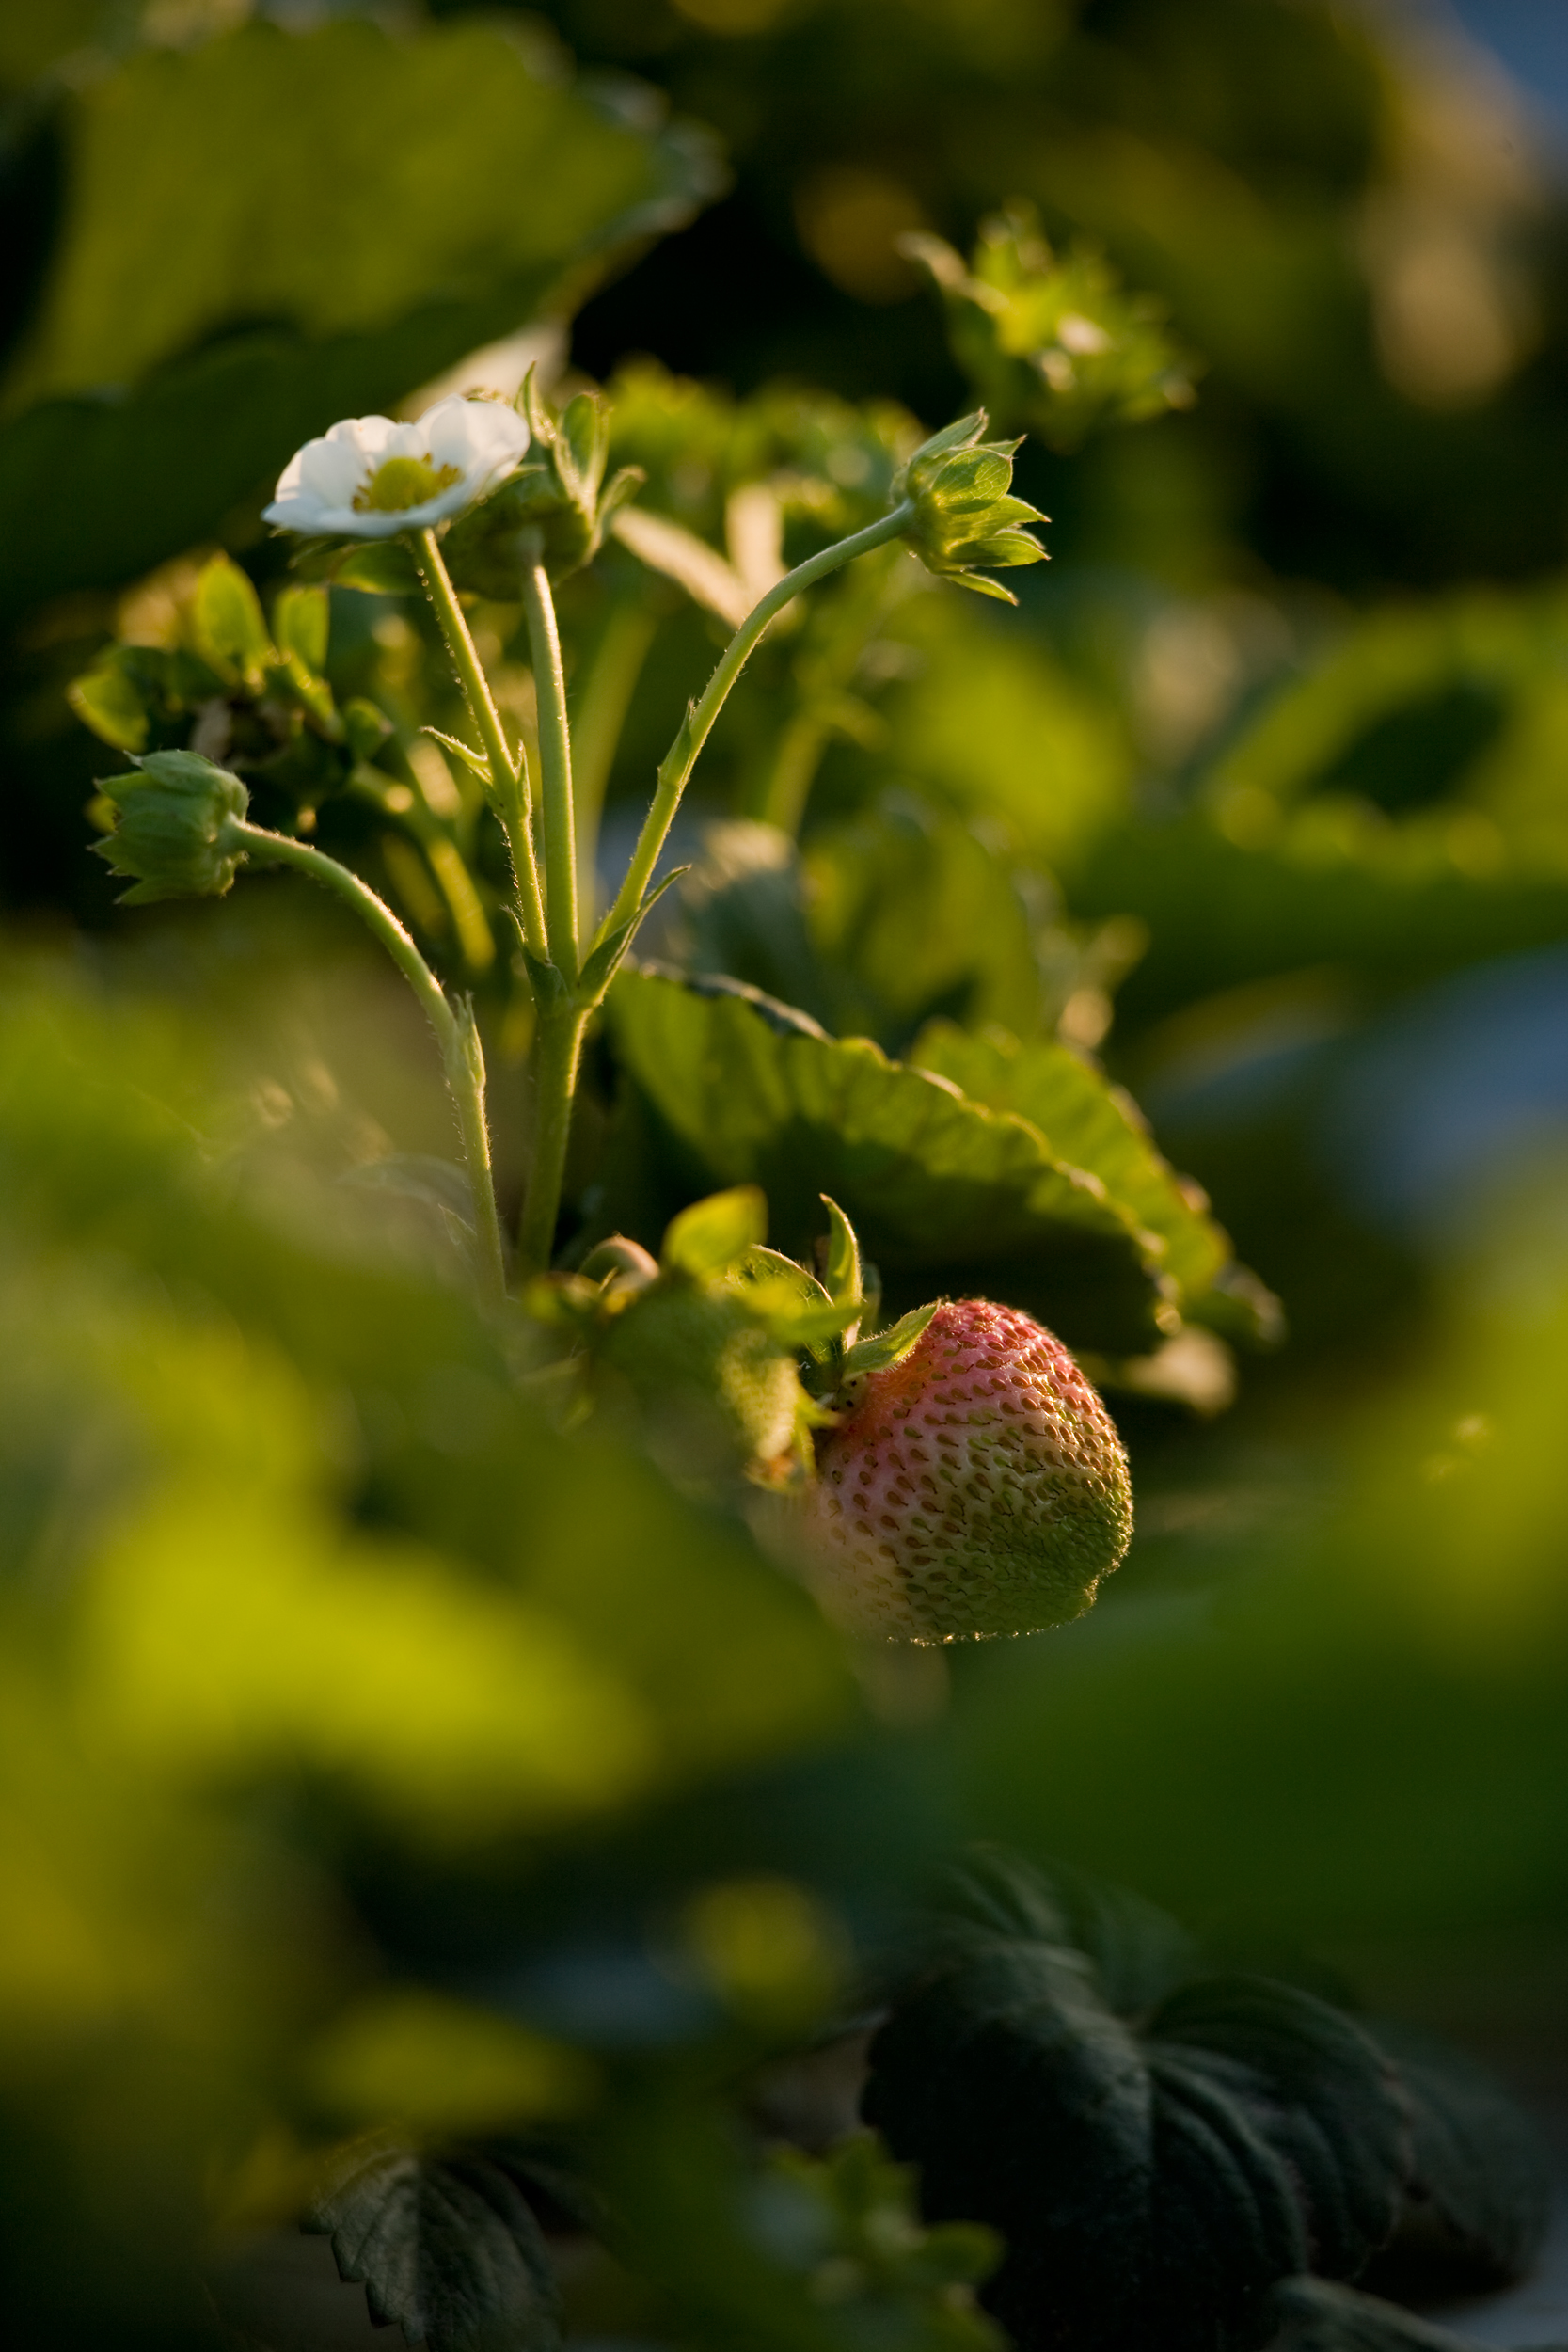 02_berry & blossom_SB_3446.jpg